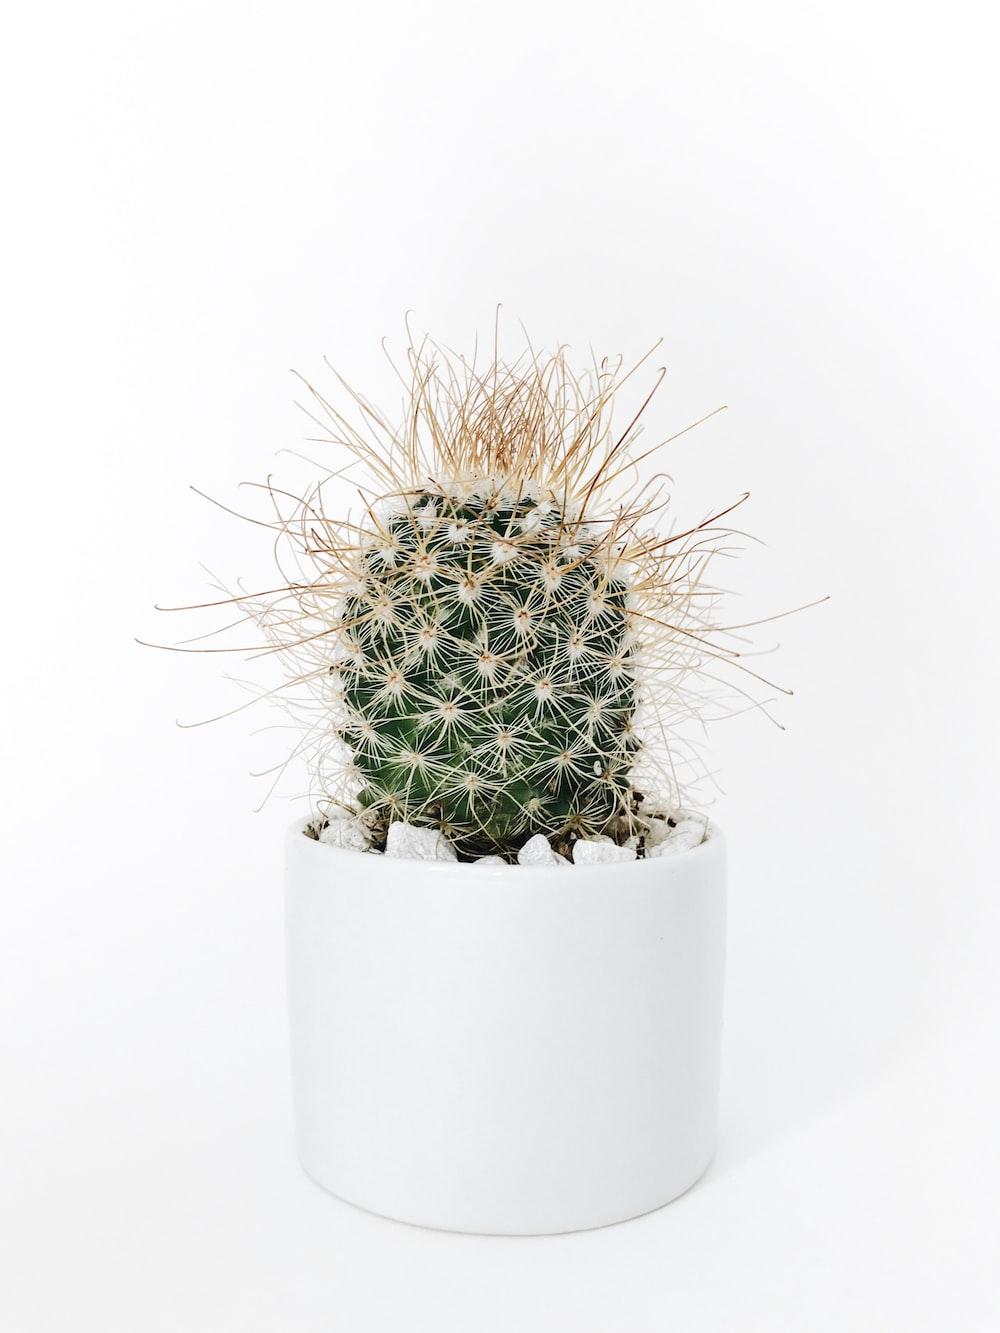 green cactus plant in vase